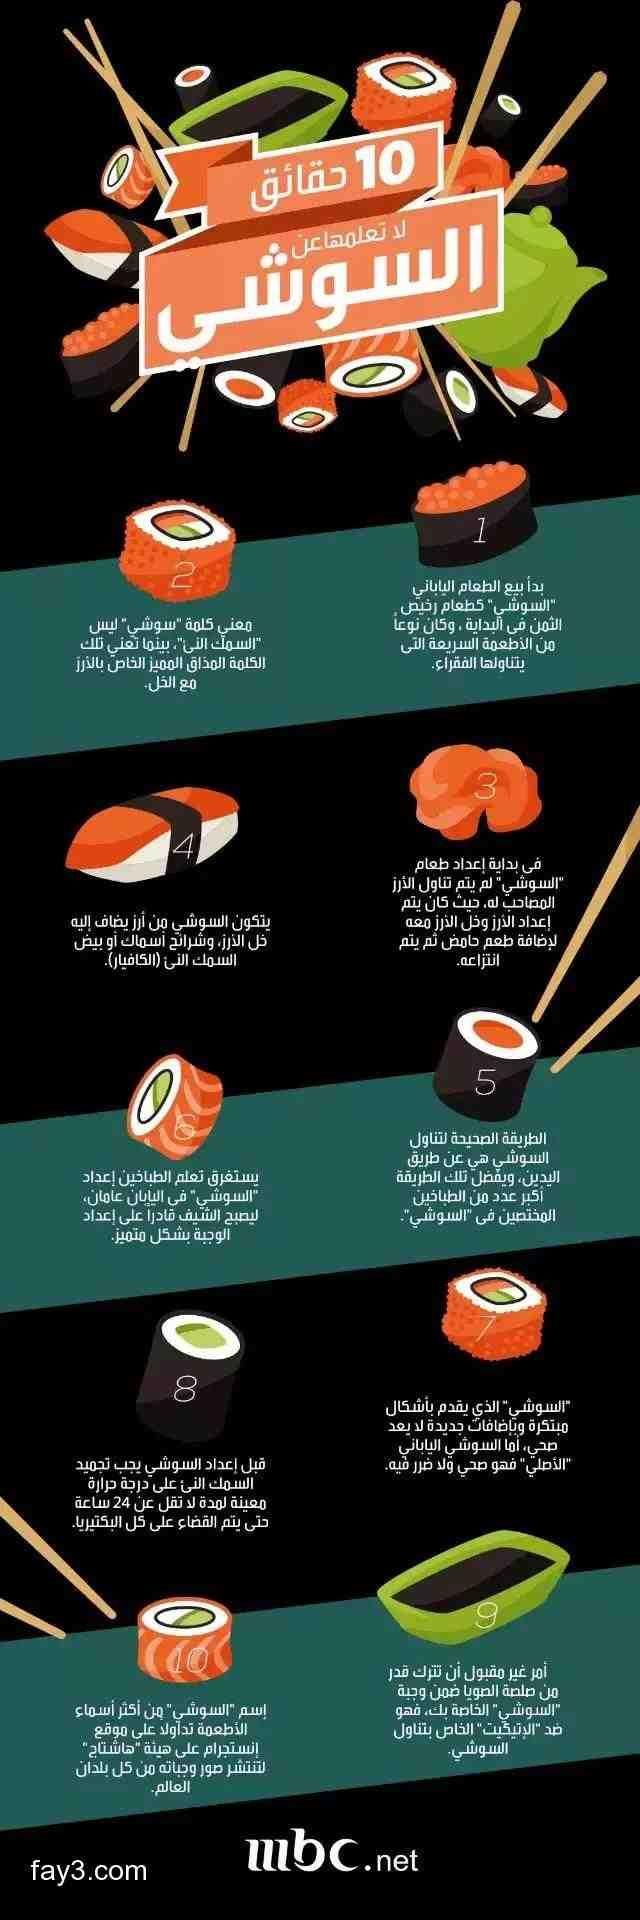 انفوجرافيك حقائق لا تعرفها عن السوشي انفوجرافيك Food Food And Drink Food Menu